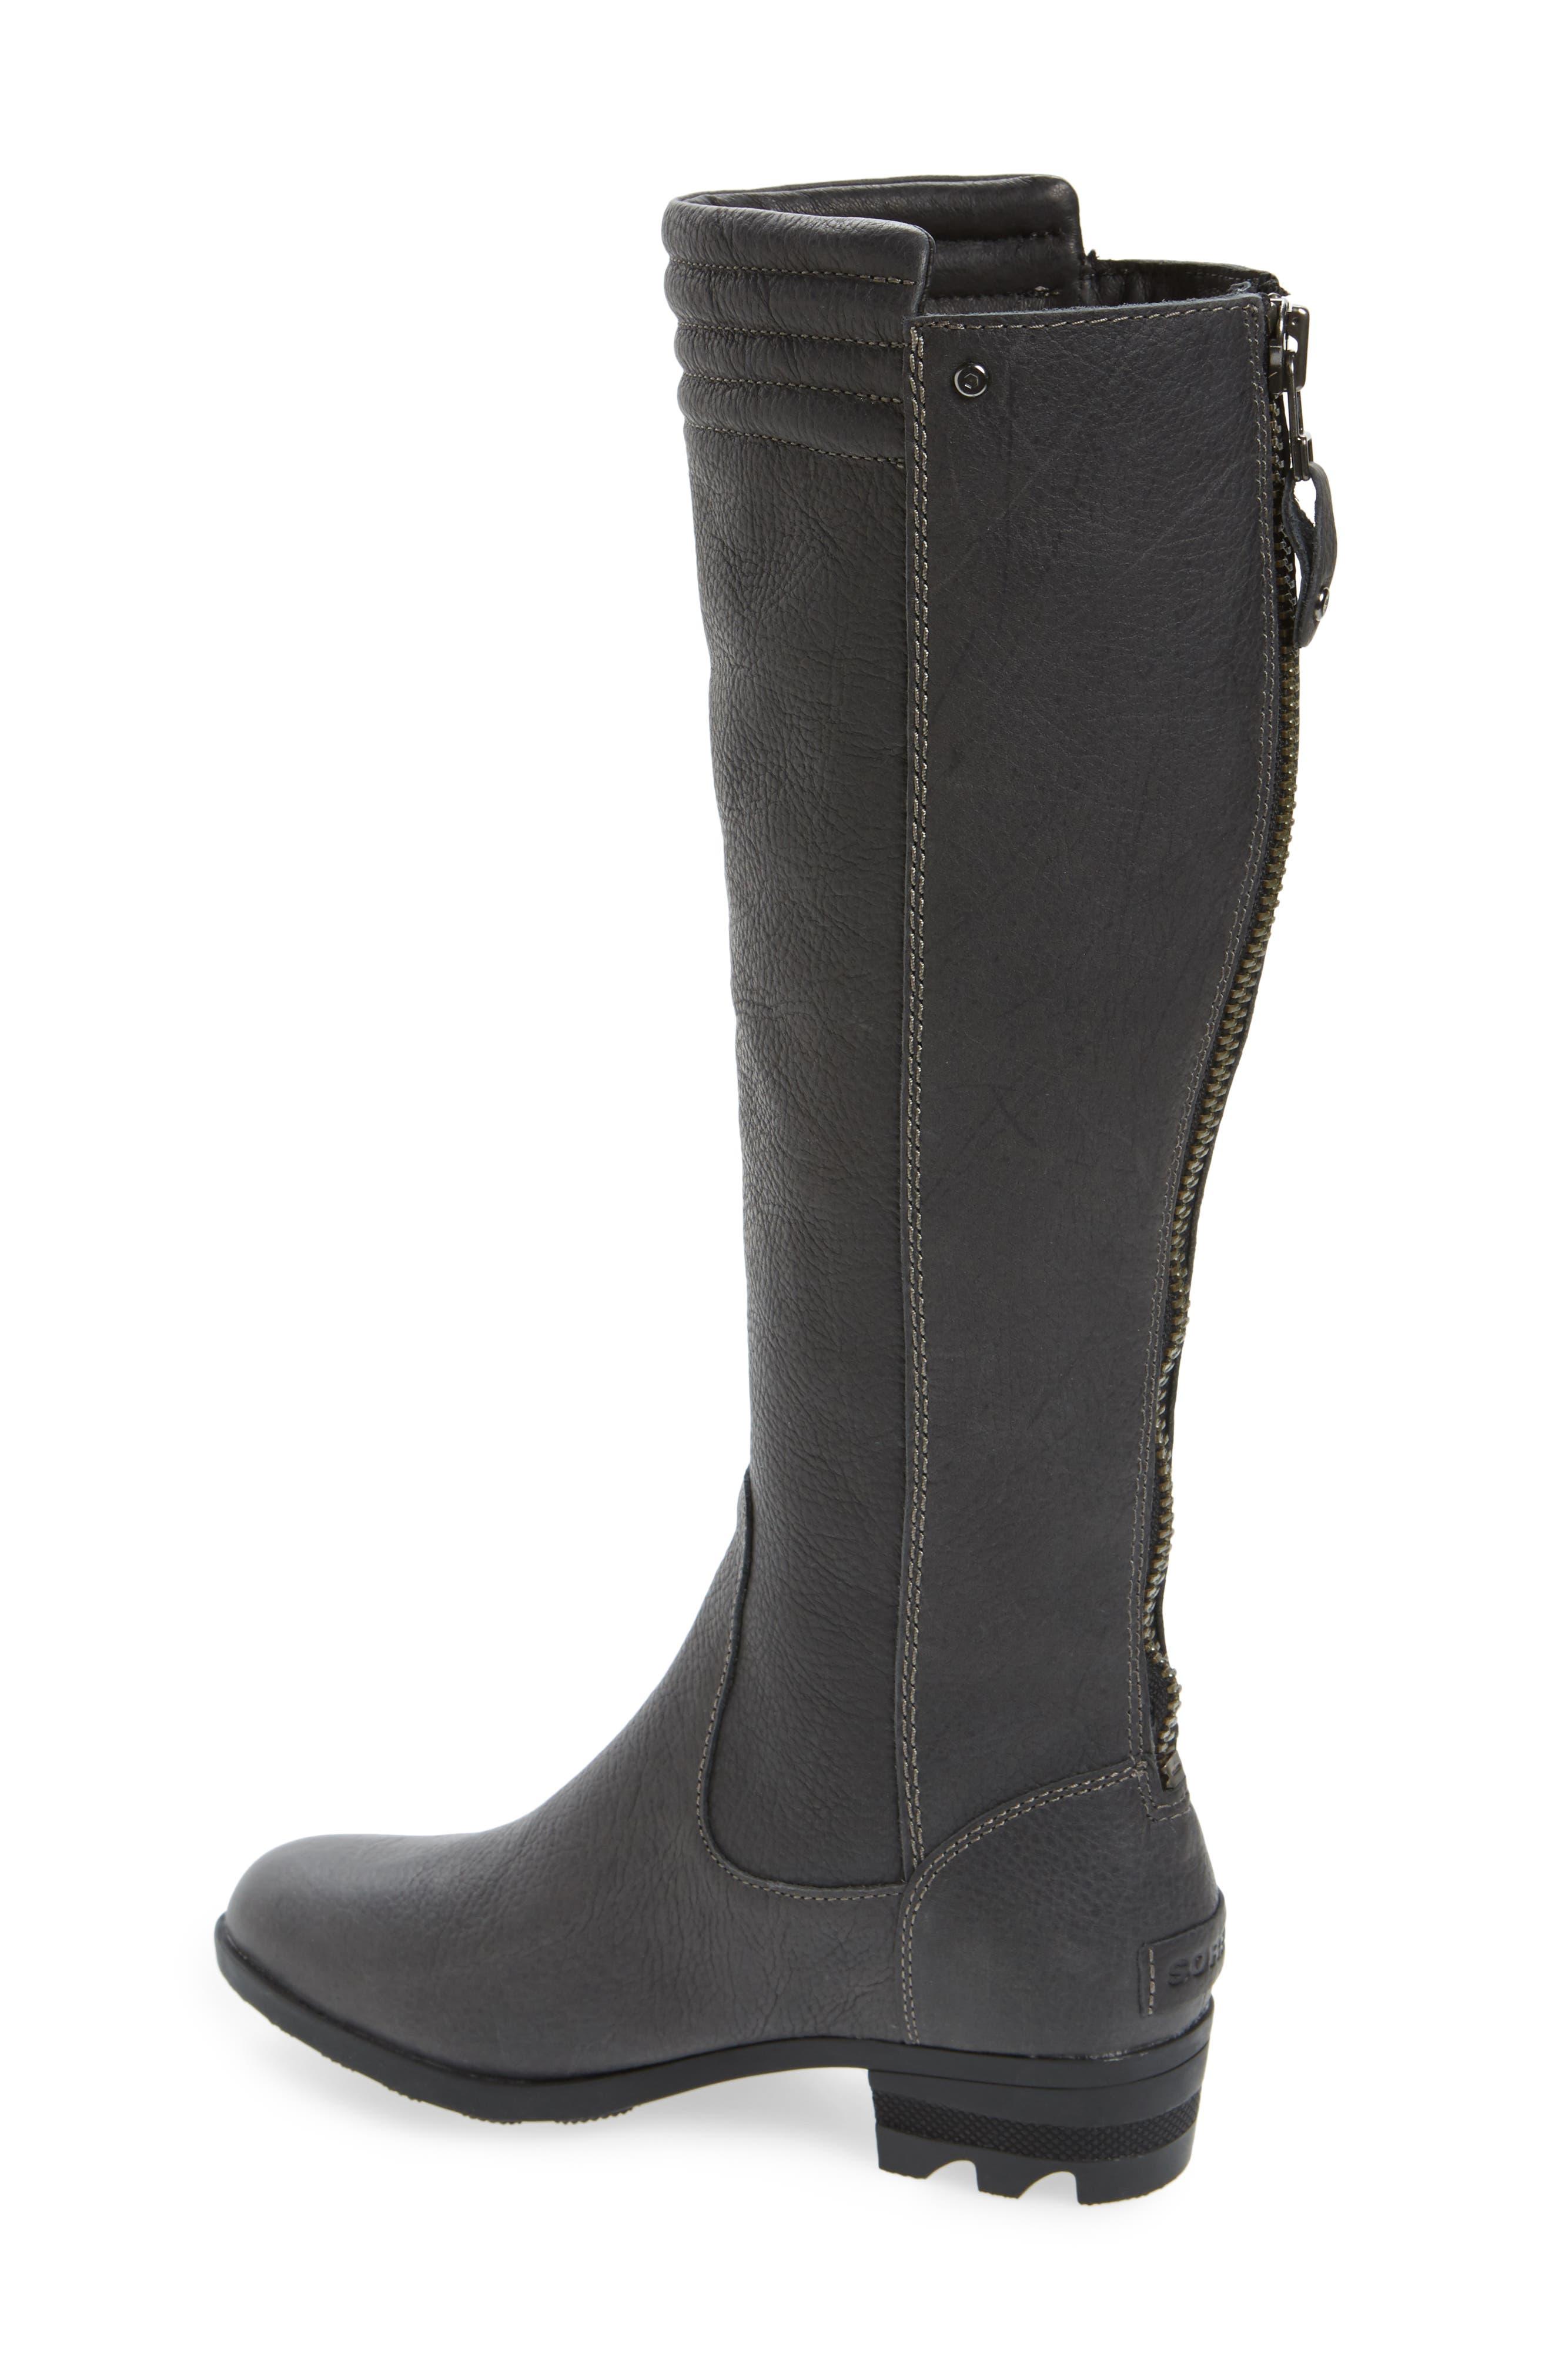 Danica Waterproof Knee High Boot,                             Alternate thumbnail 2, color,                             Quarry/ Black